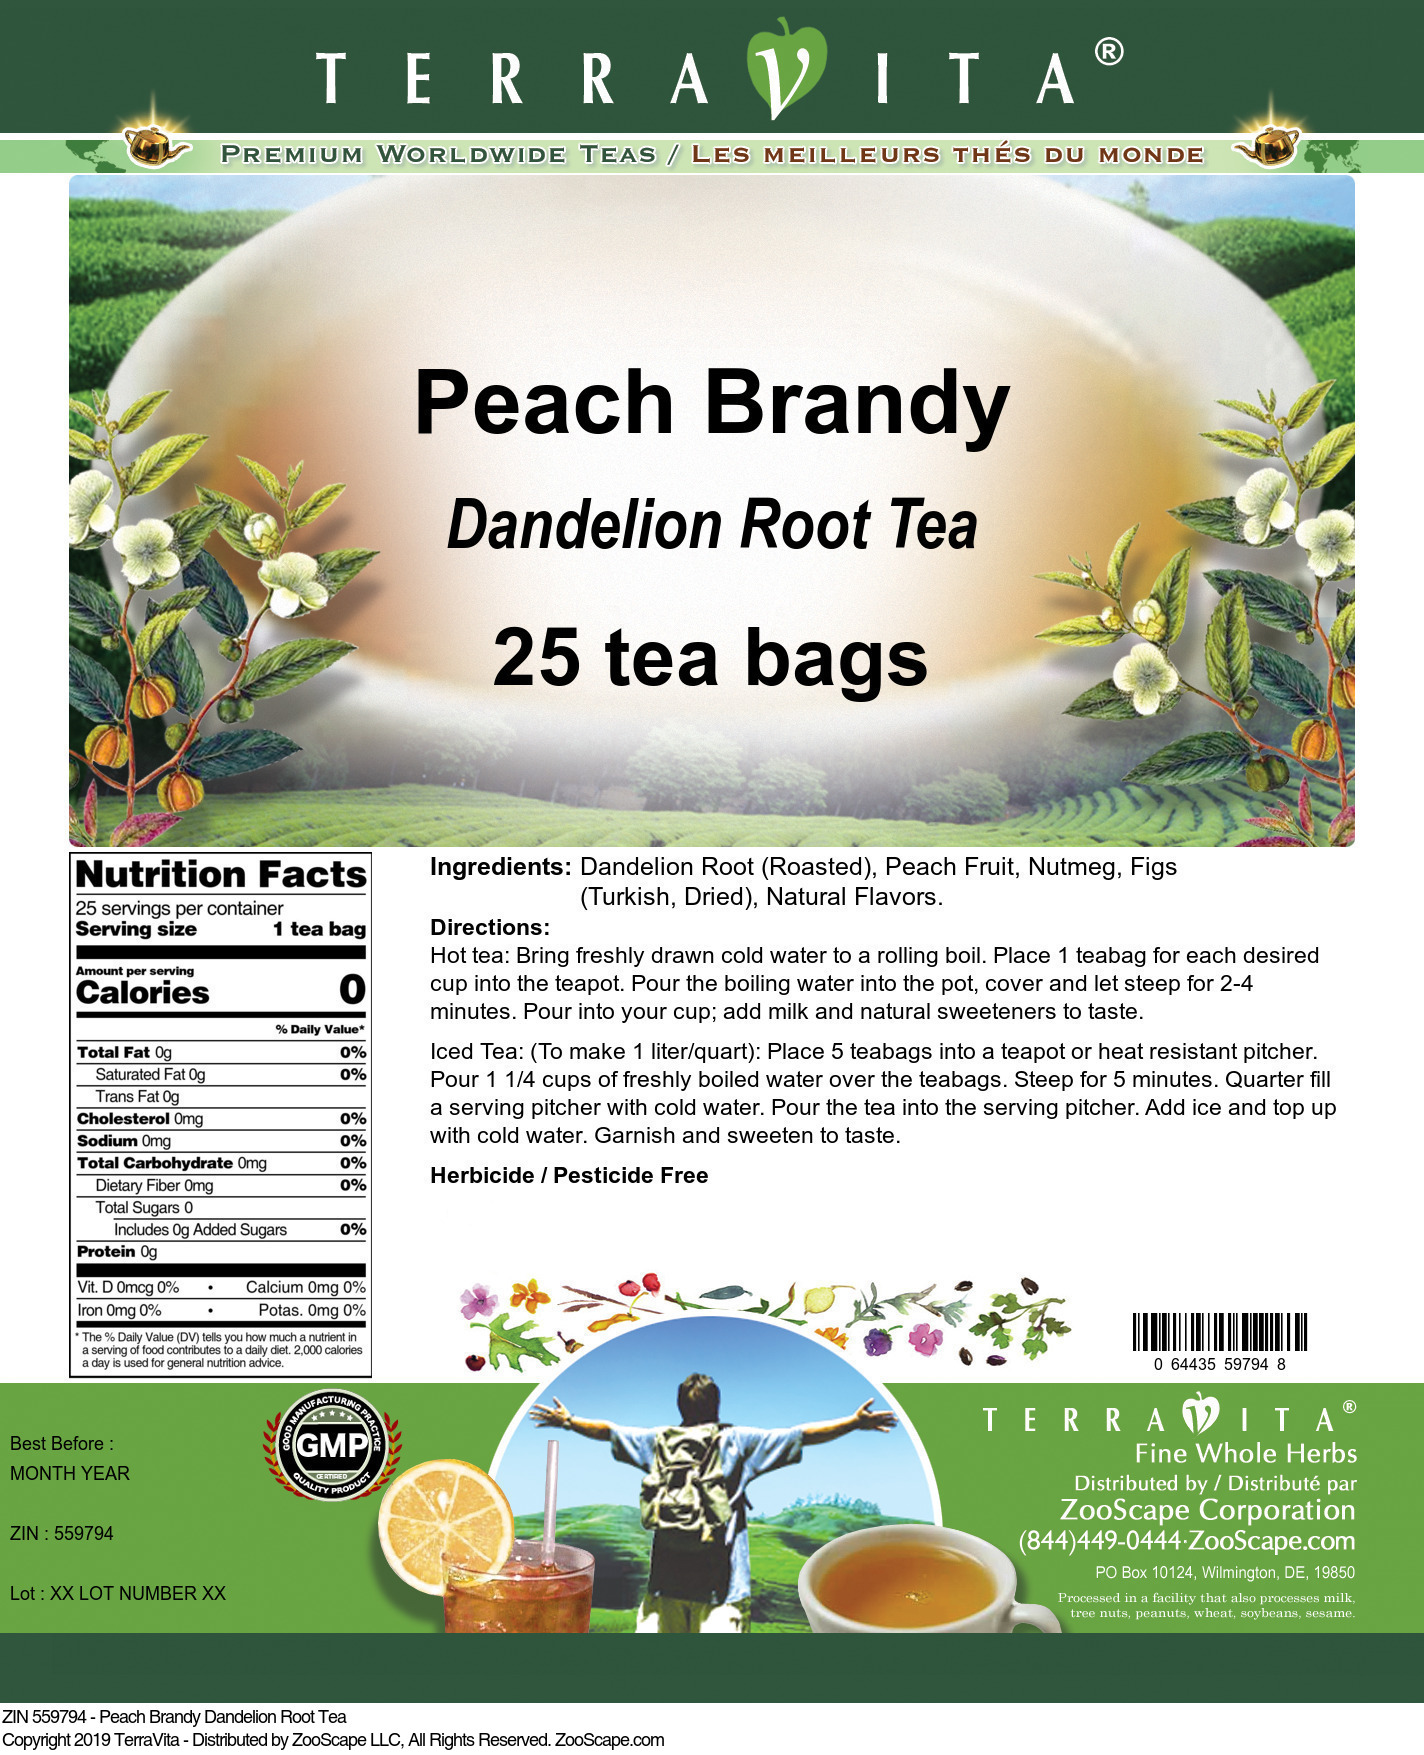 Peach Brandy Dandelion Root